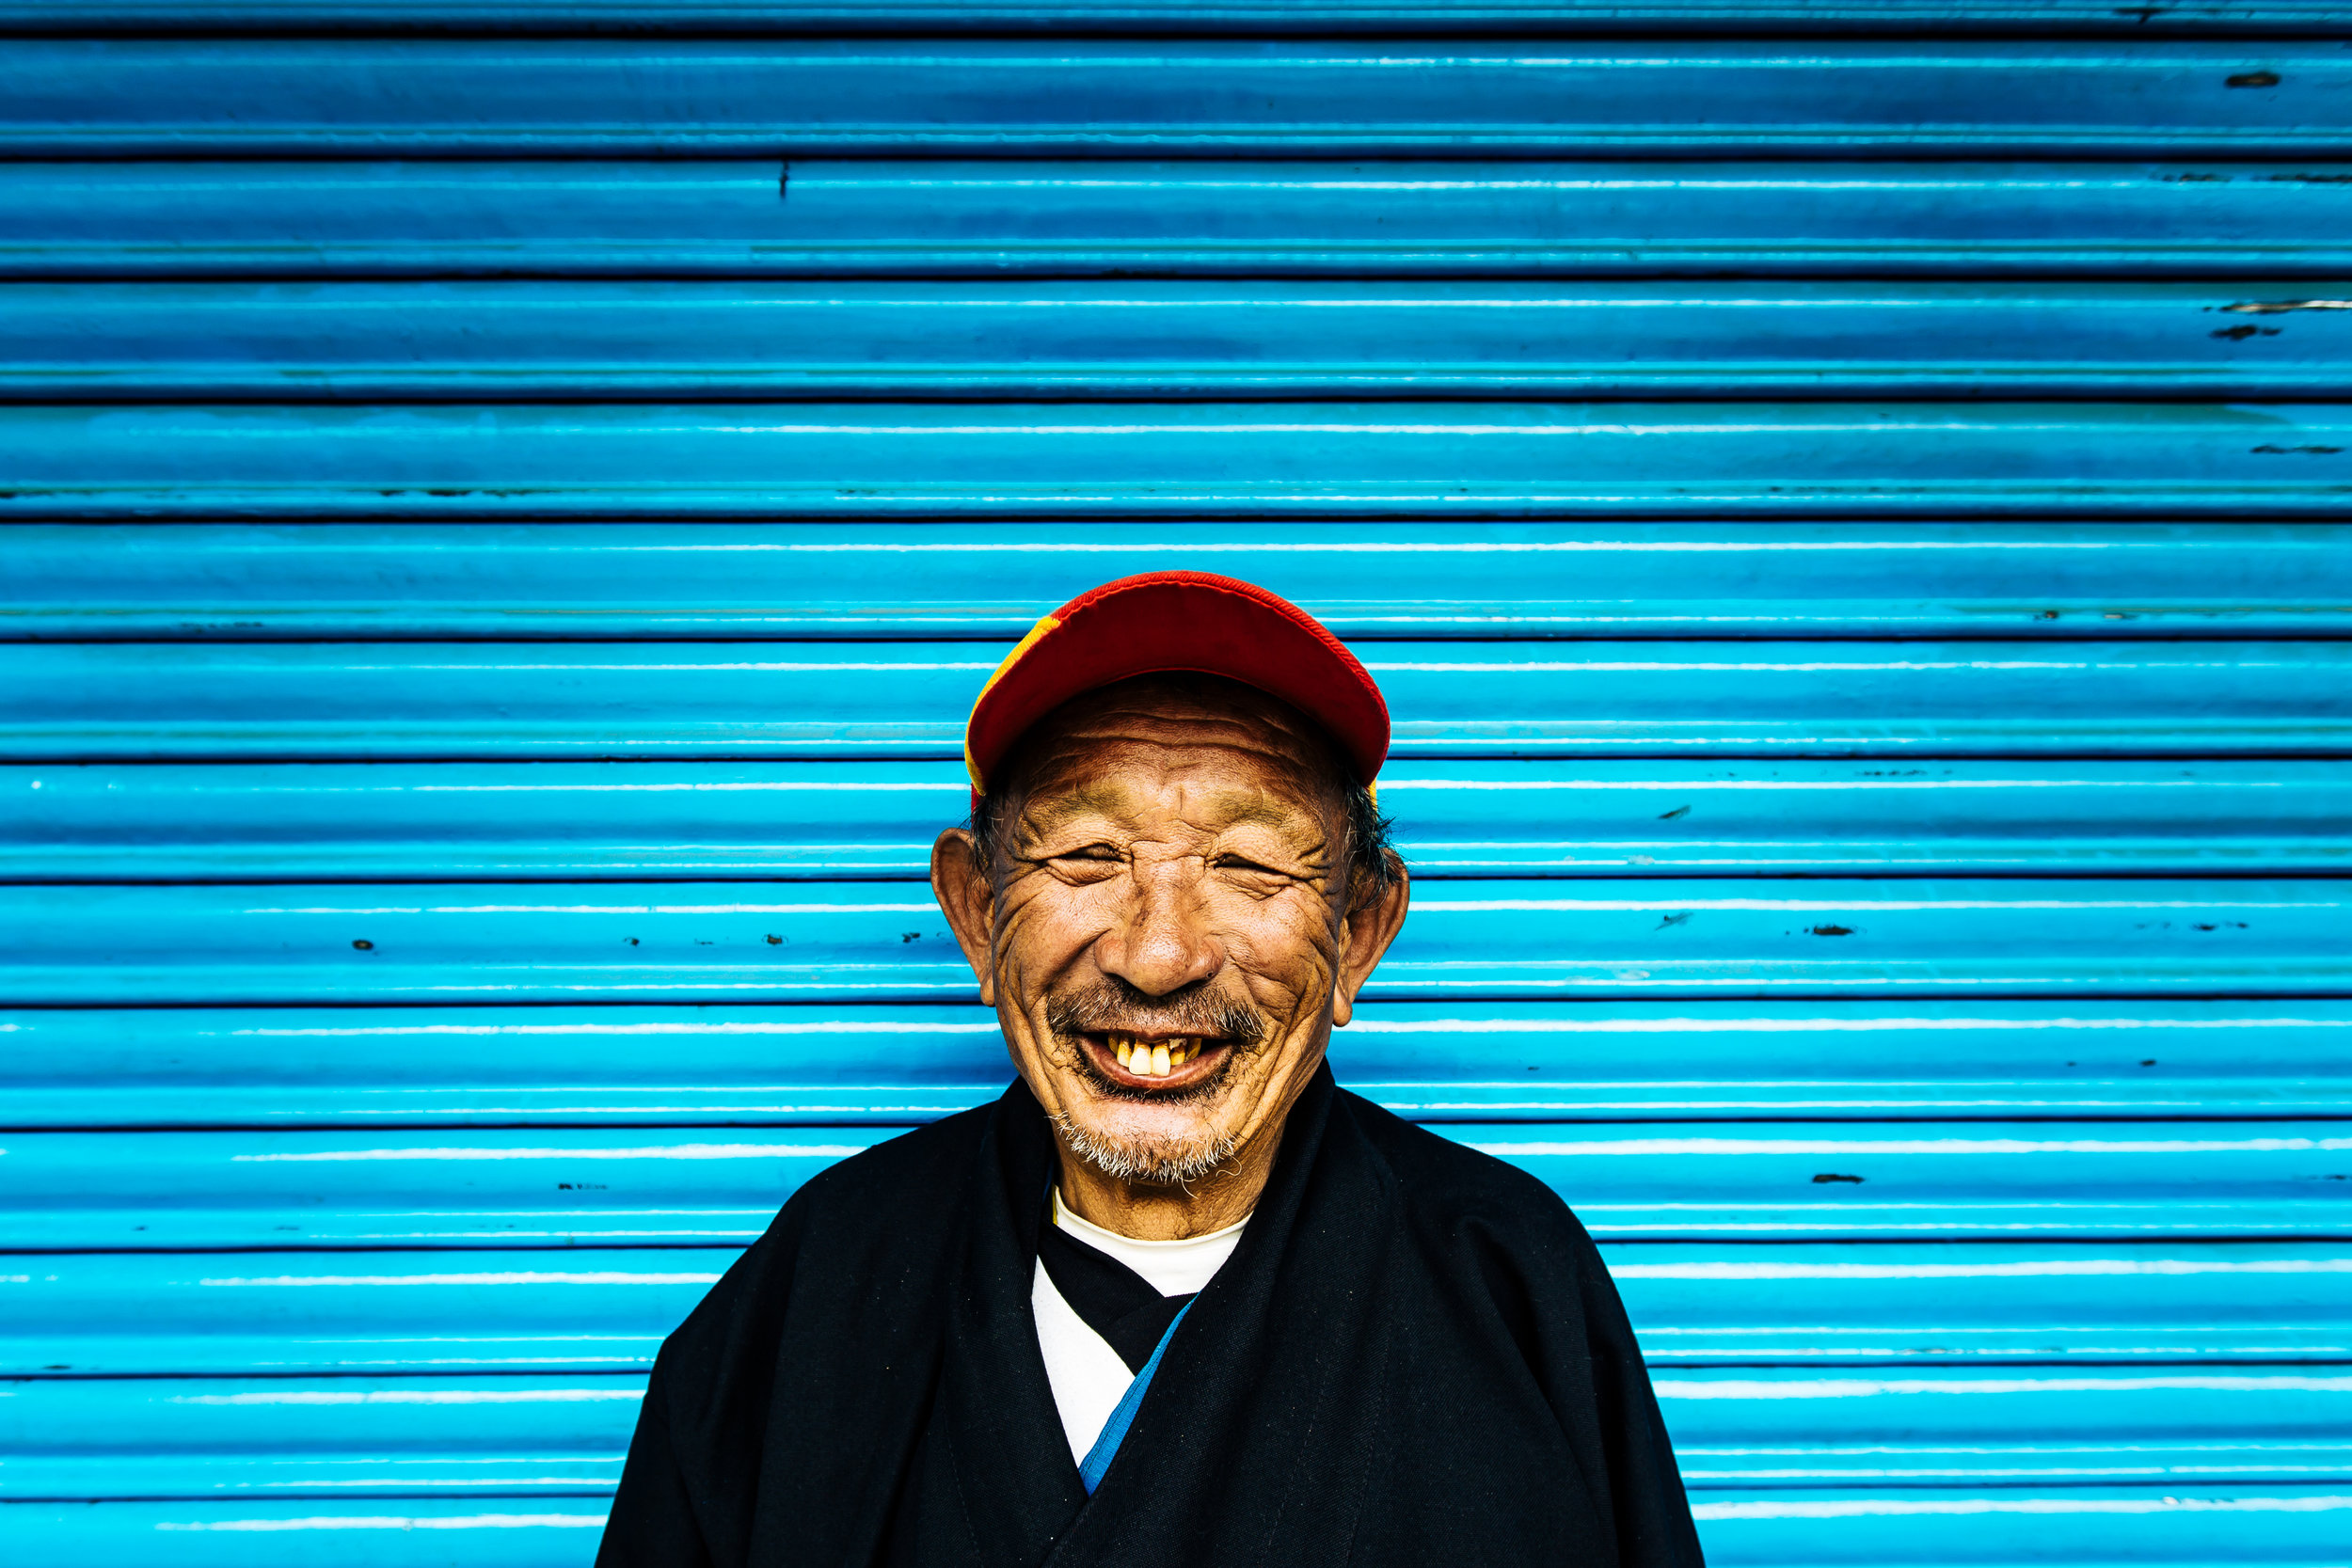 Bhutan-smiling-man (1 of 1).jpg